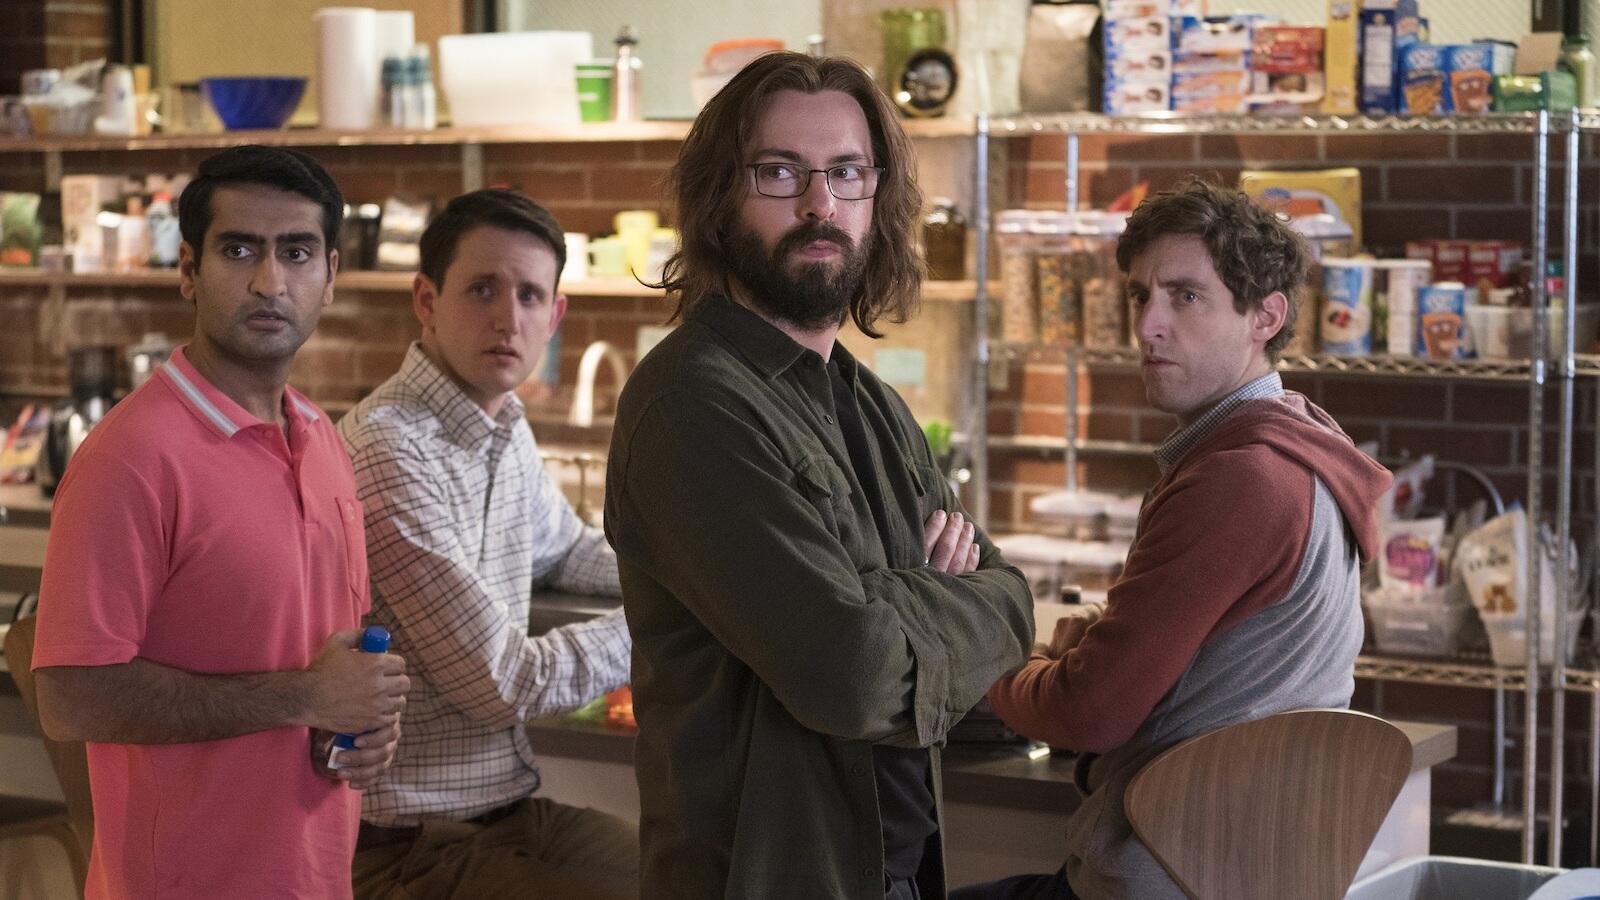 Kumail Nanjiani, Zach Woods, Martin Starr, and Thomas Middleditch, Silicon Valley